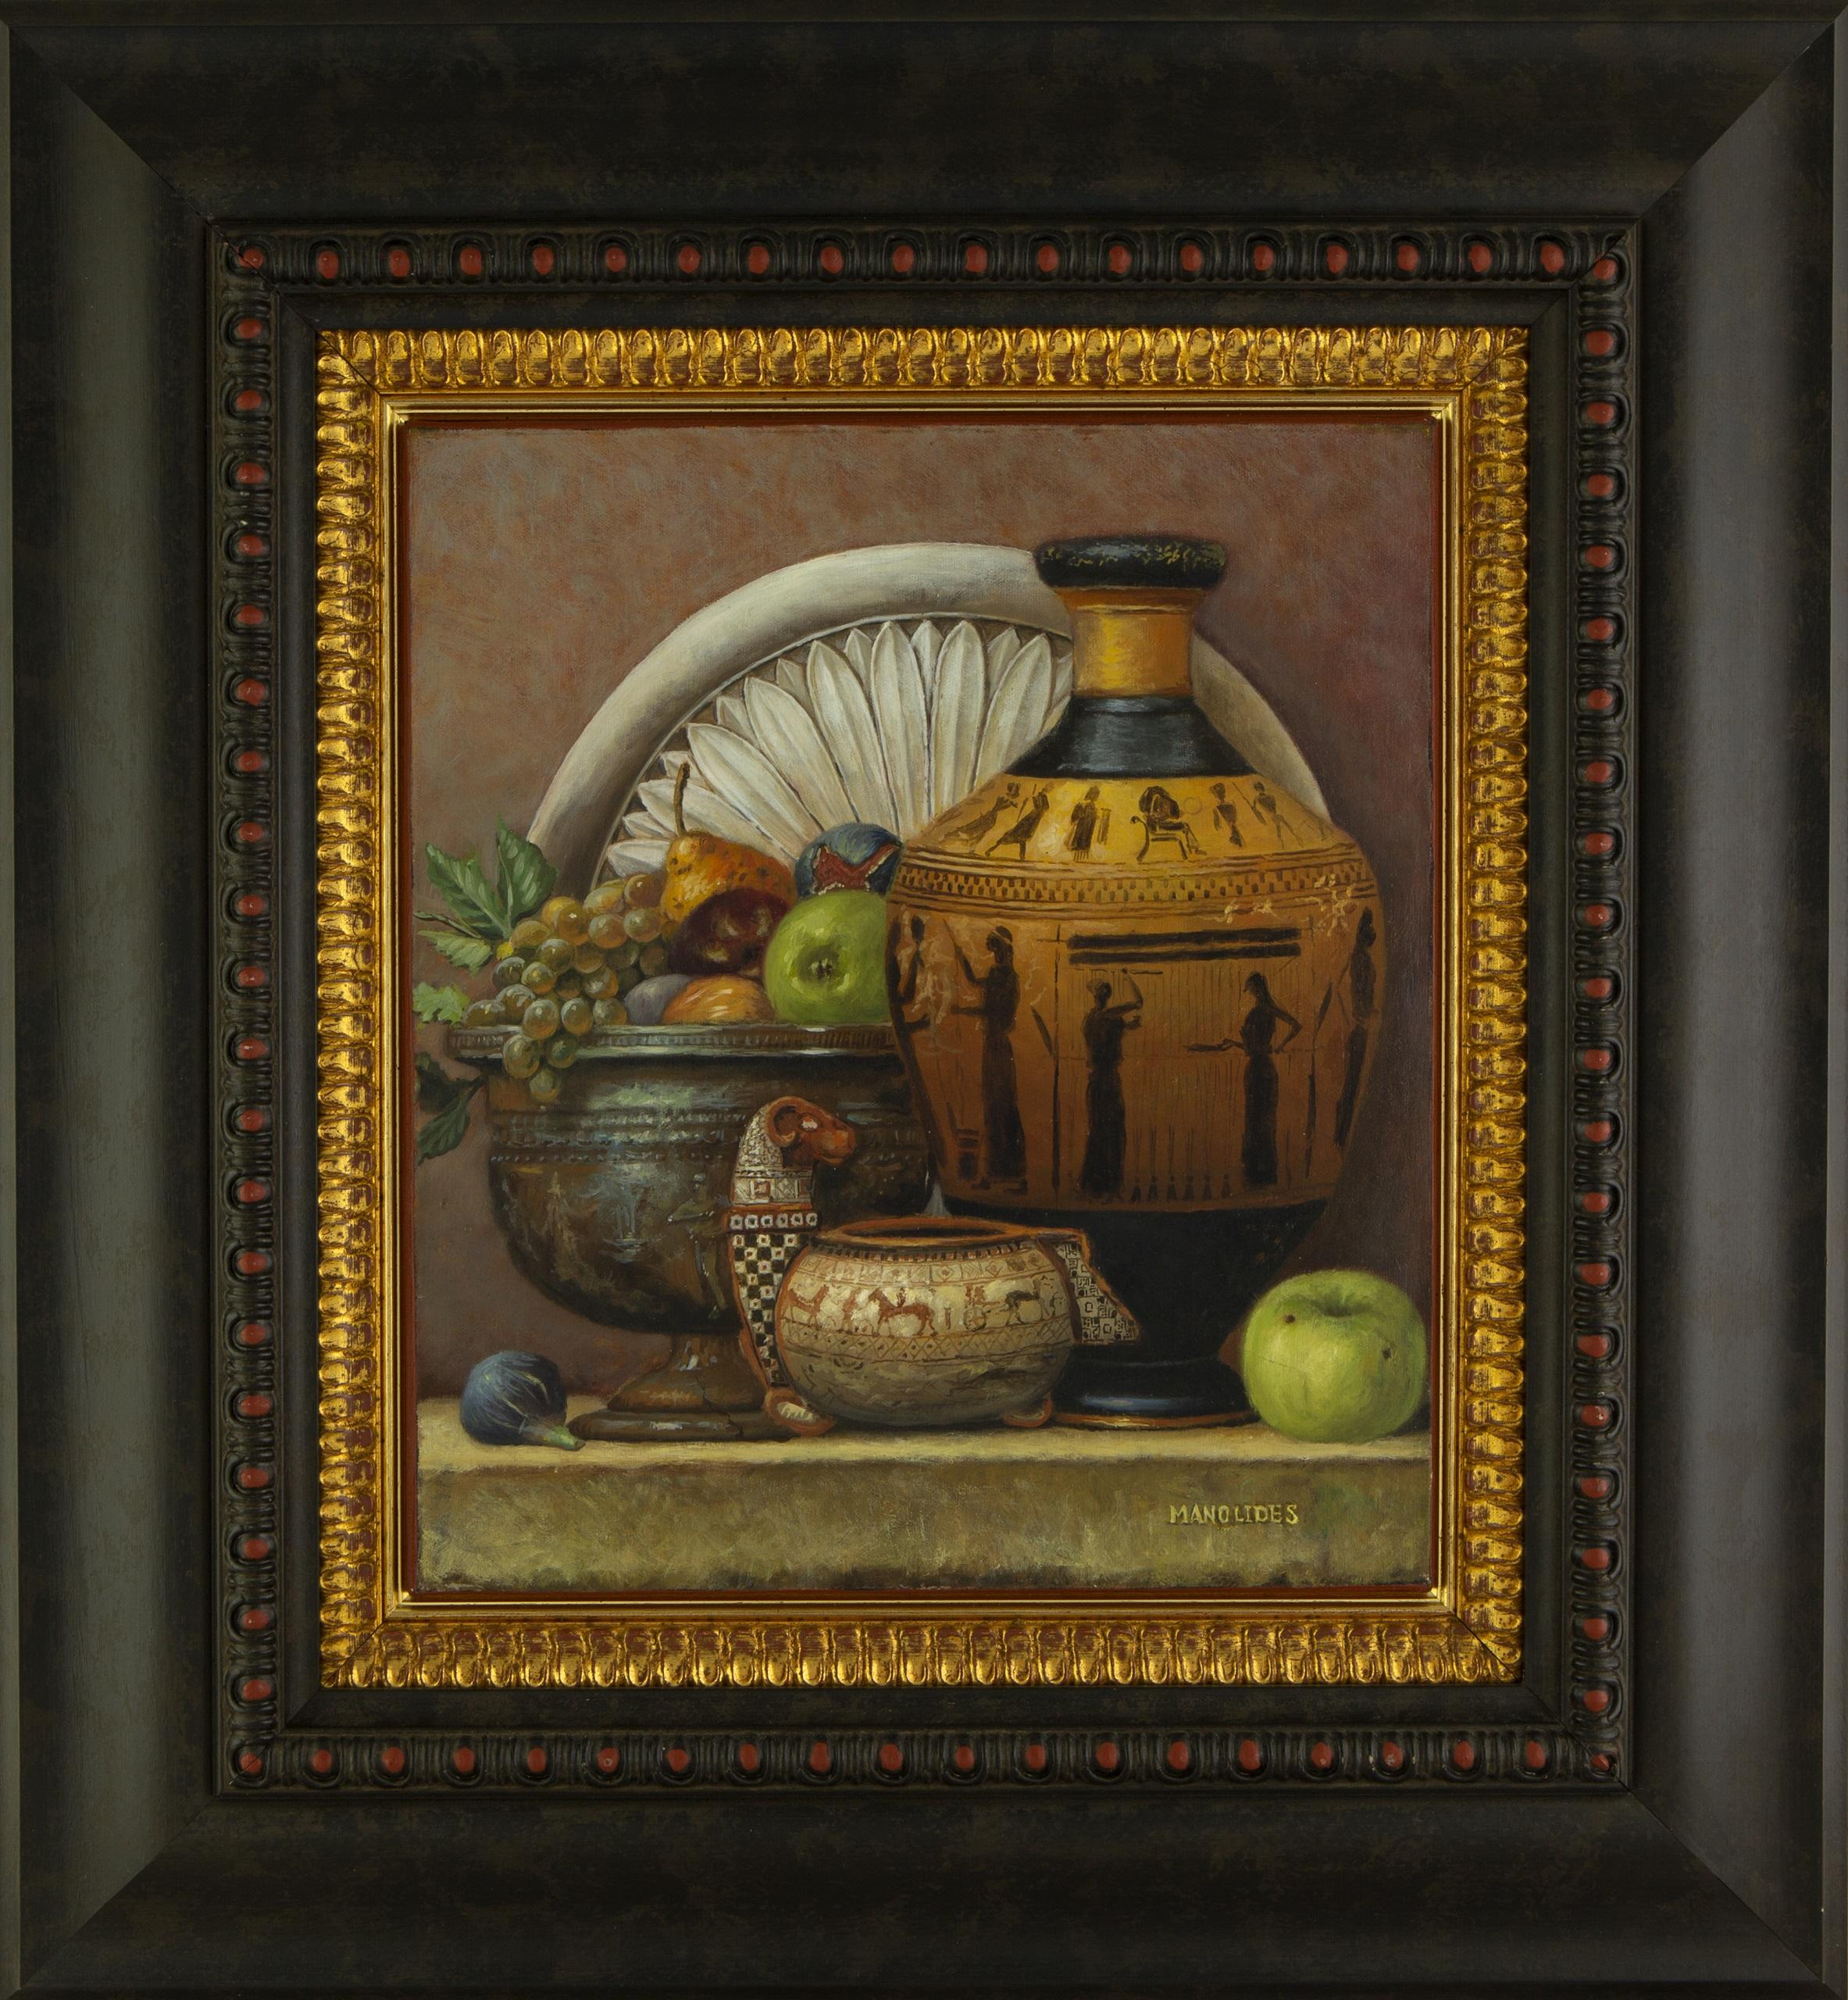 Theodoros Manolidis (Greek, born 1940) (AR), Still life with Ancient Greek vase, oil on canvas